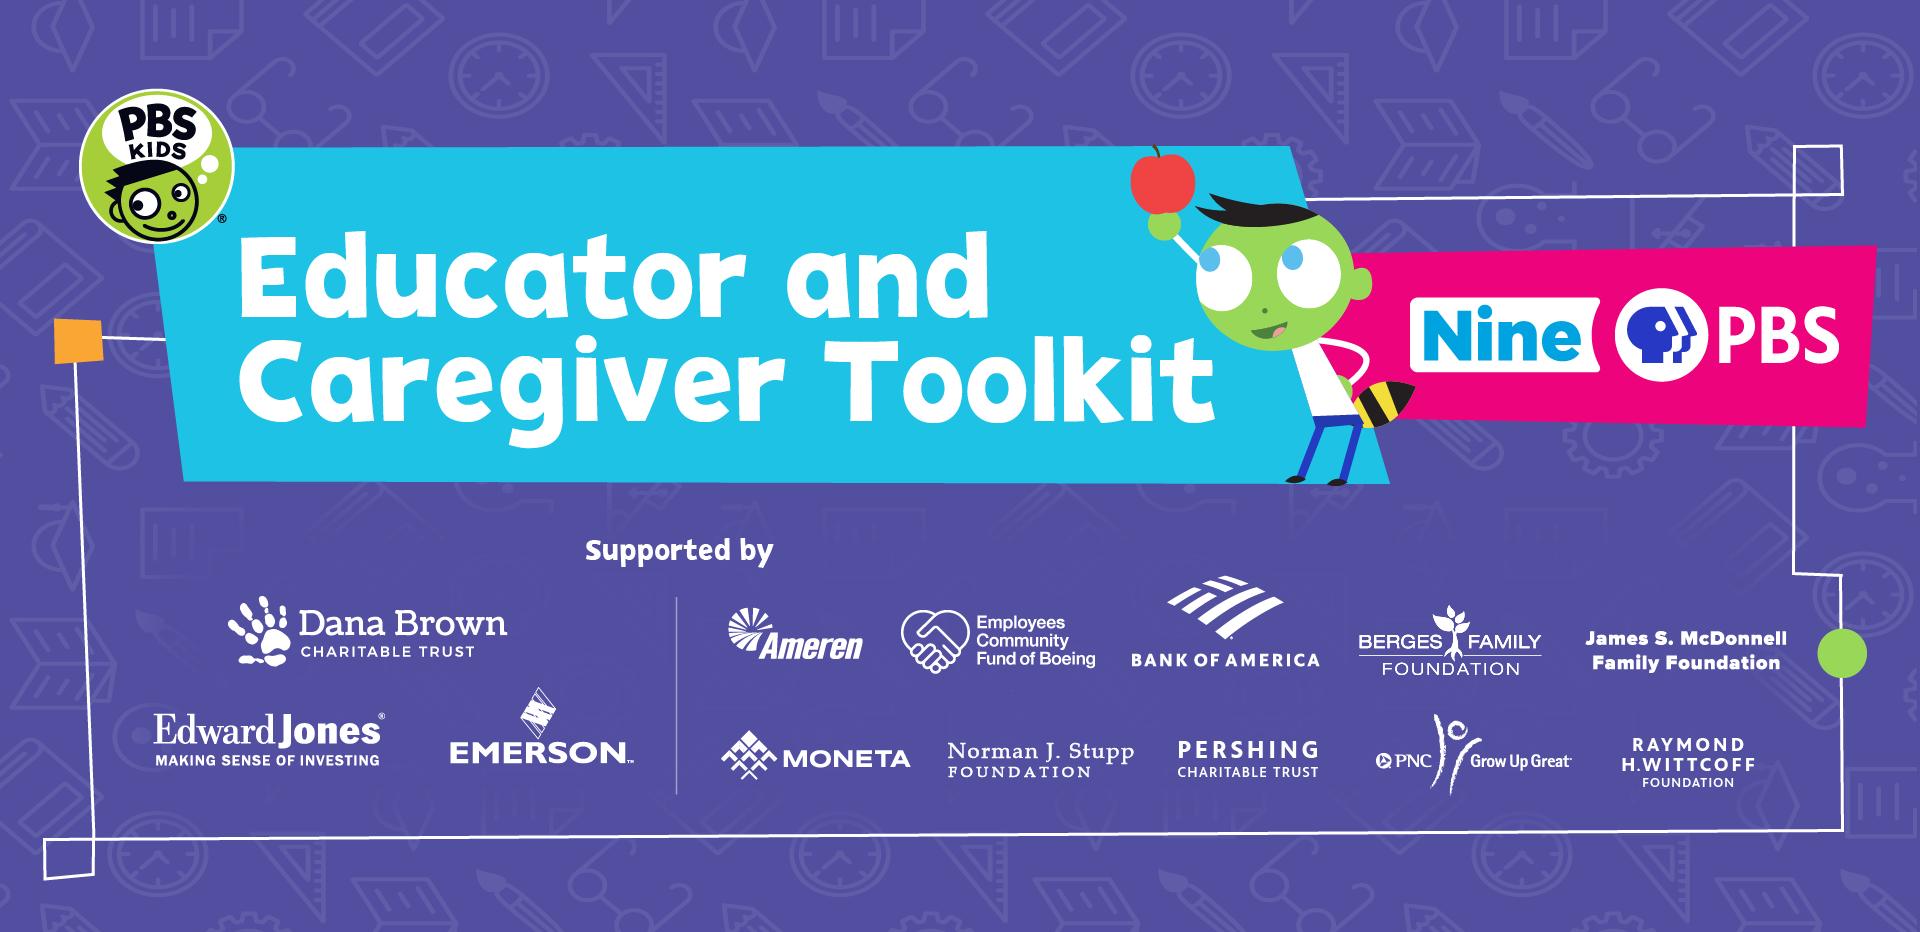 Nine PBS Educator and Caregiver Toolkit